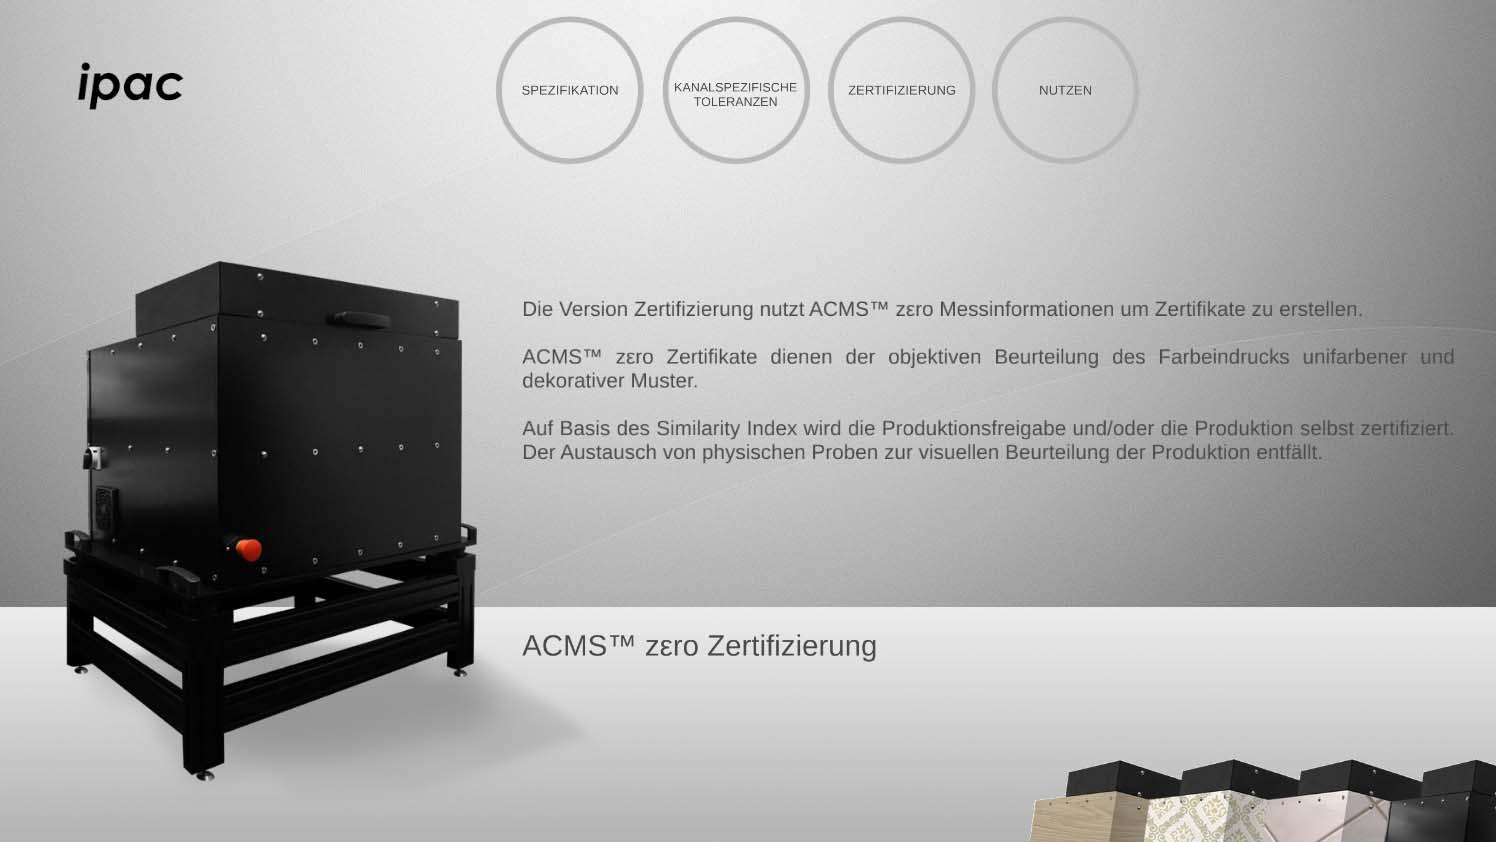 ACMS zero Zertifizierung